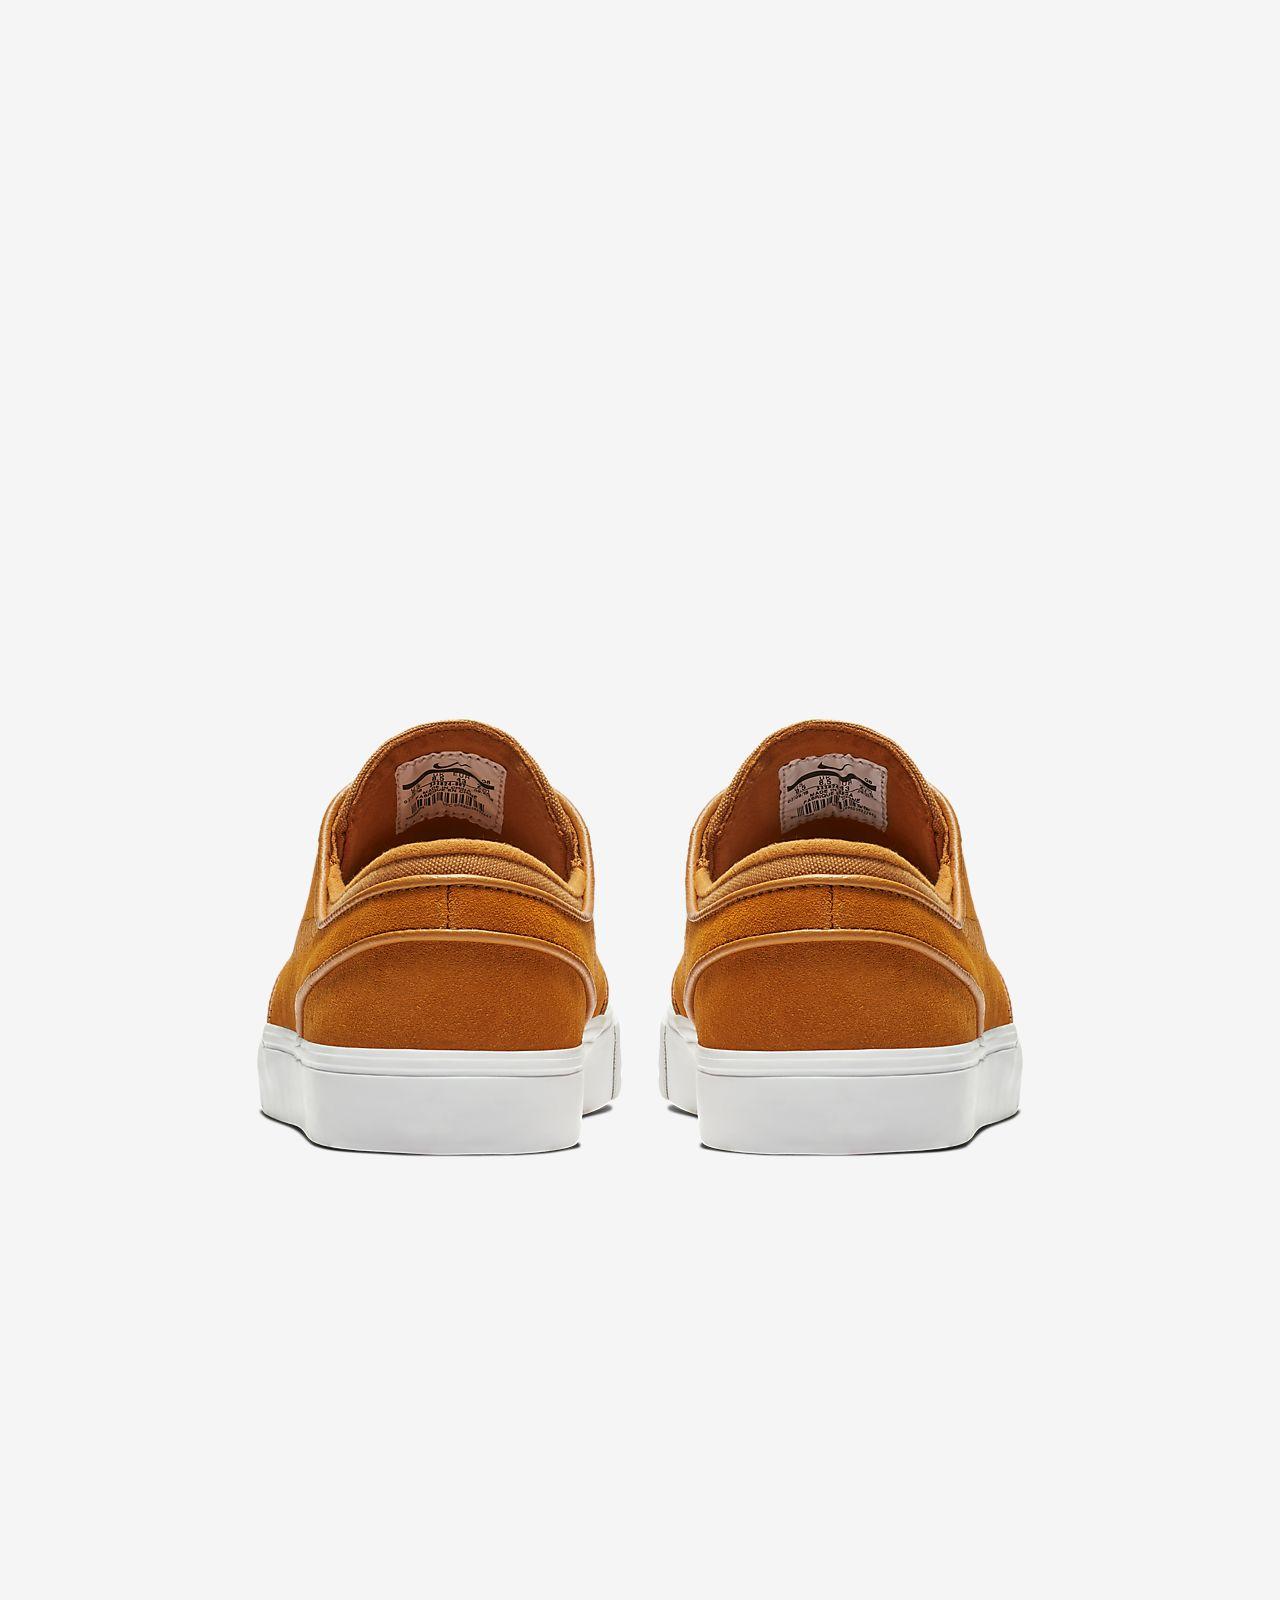 promo code d394f dab23 ... Nike Zoom Stefan Janoski Men s Skate Shoe